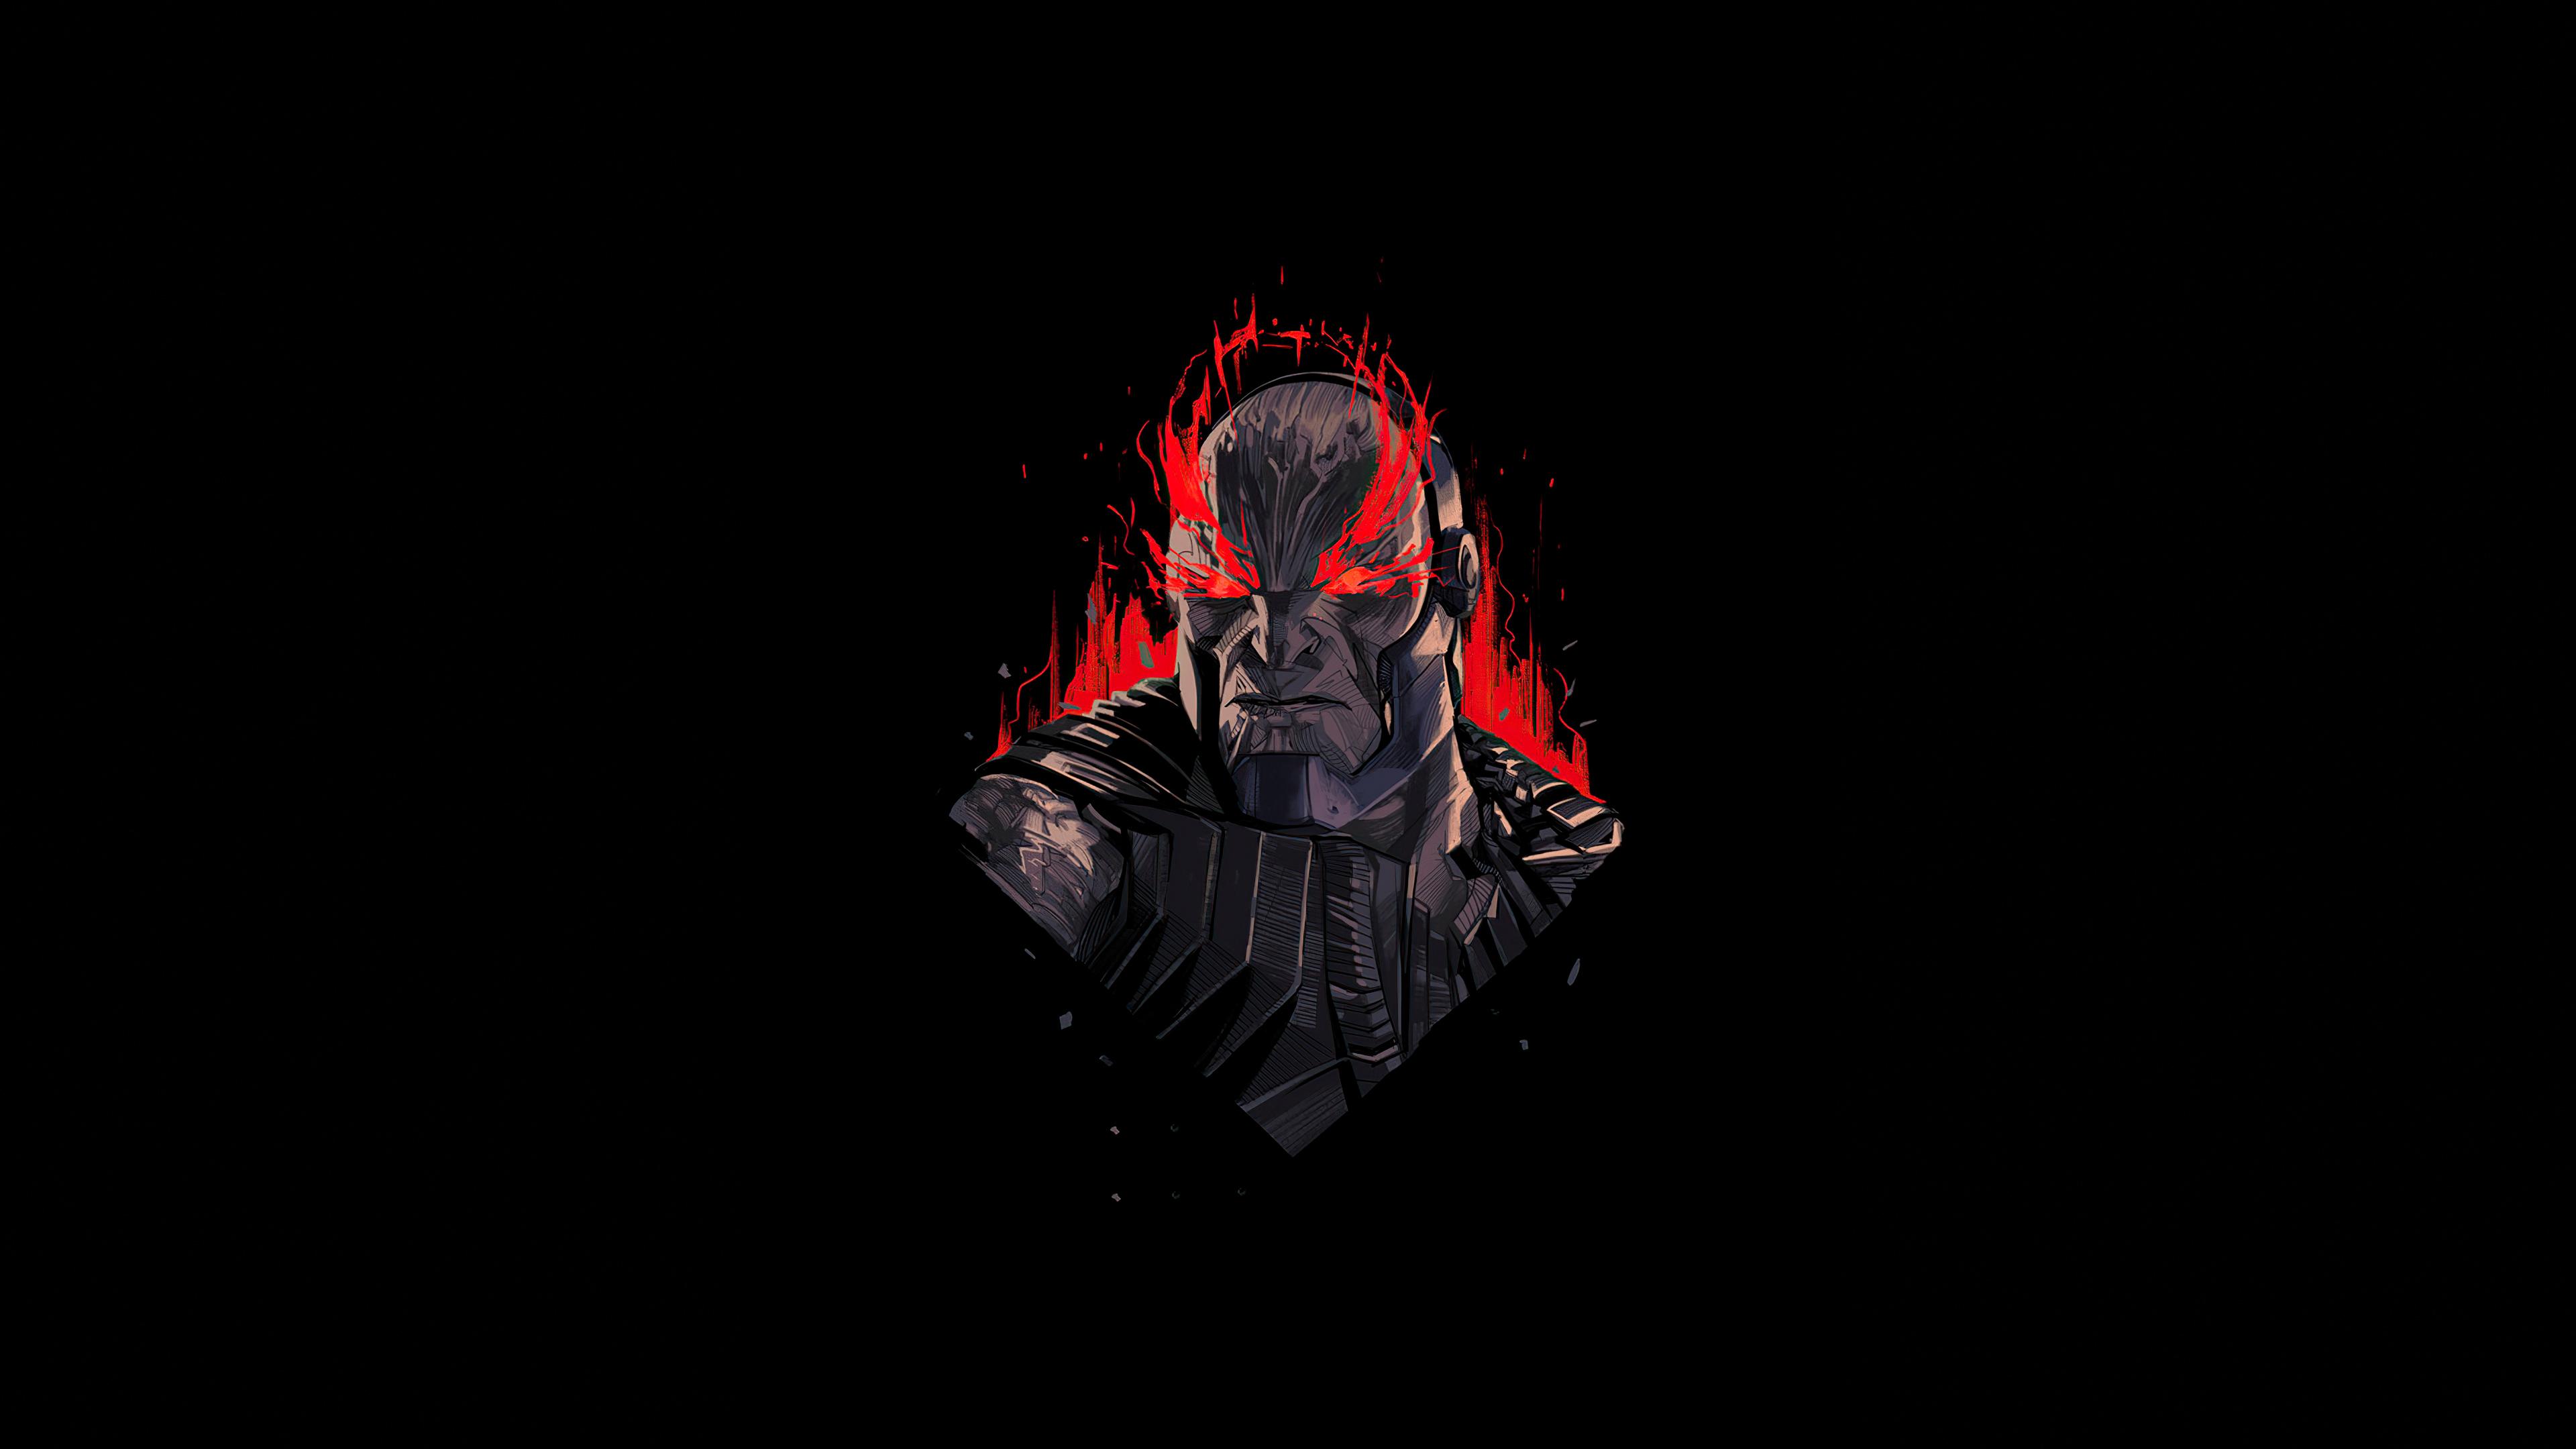 dark seid justice league minimal 4k 1618165824 - Dark Seid Justice League Minimal 4k - Dark Seid Justice League Minimal 4k wallpapers